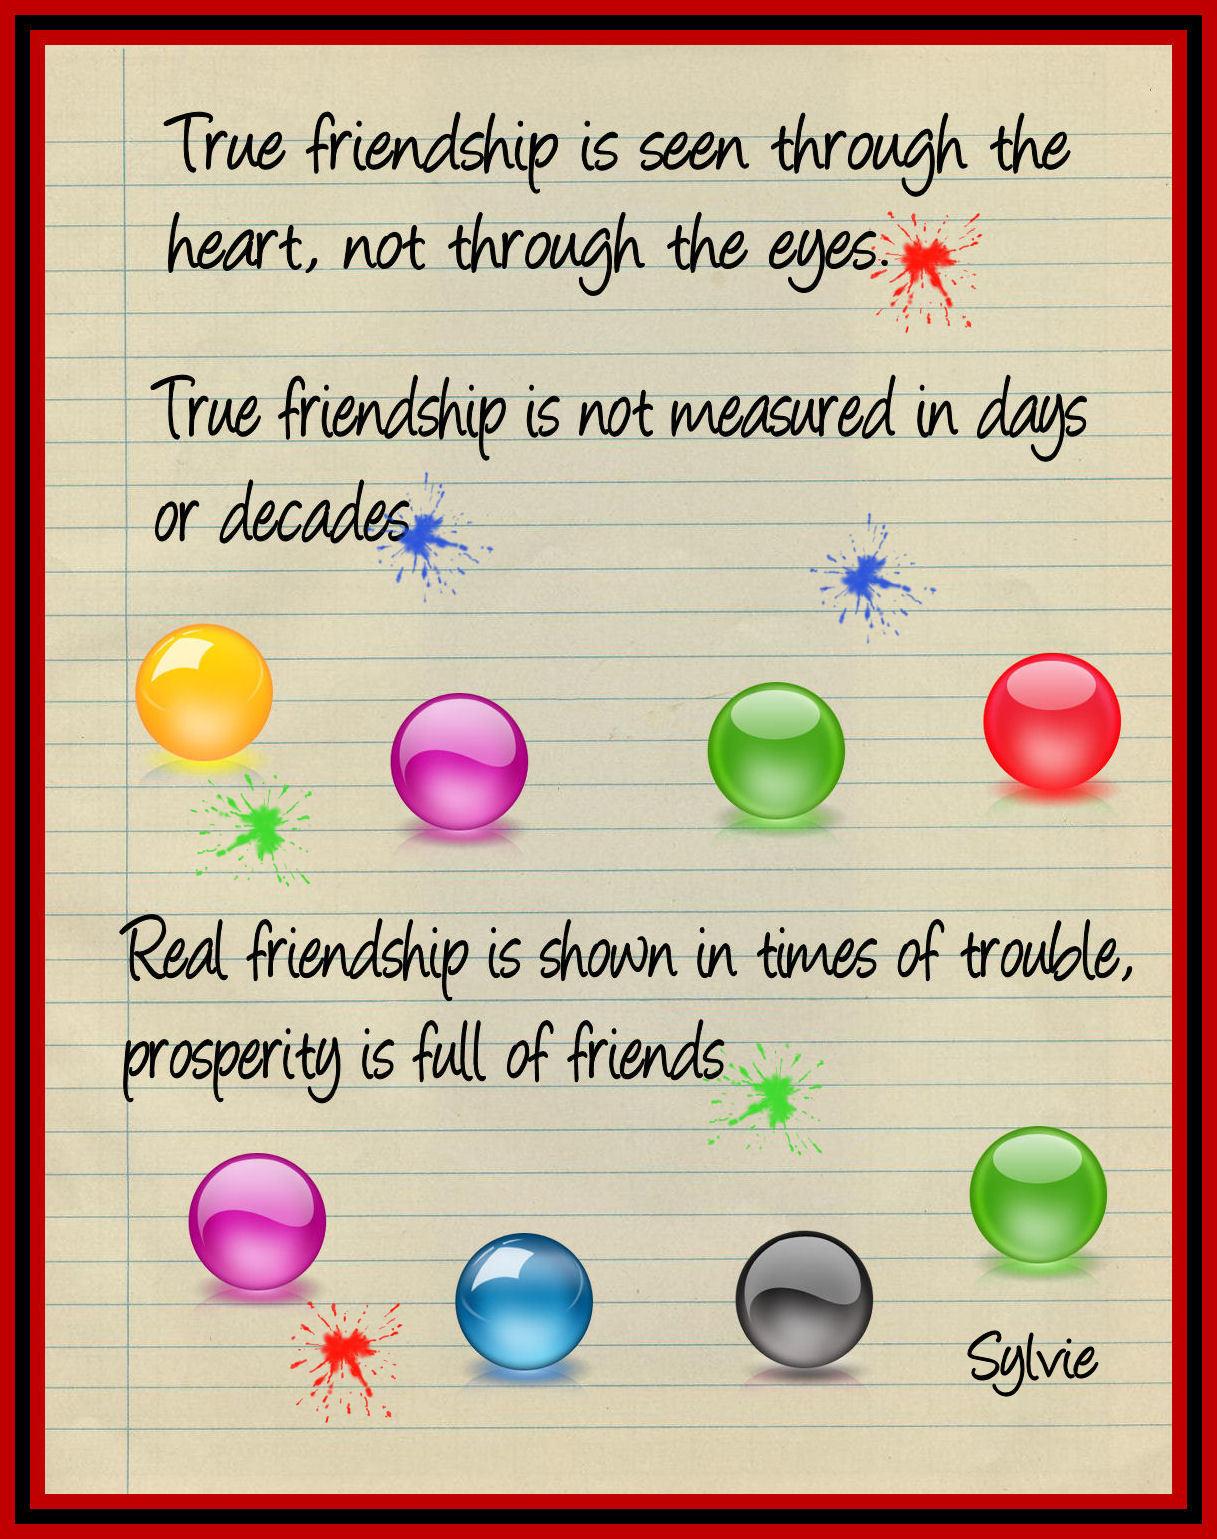 Friend quote #1